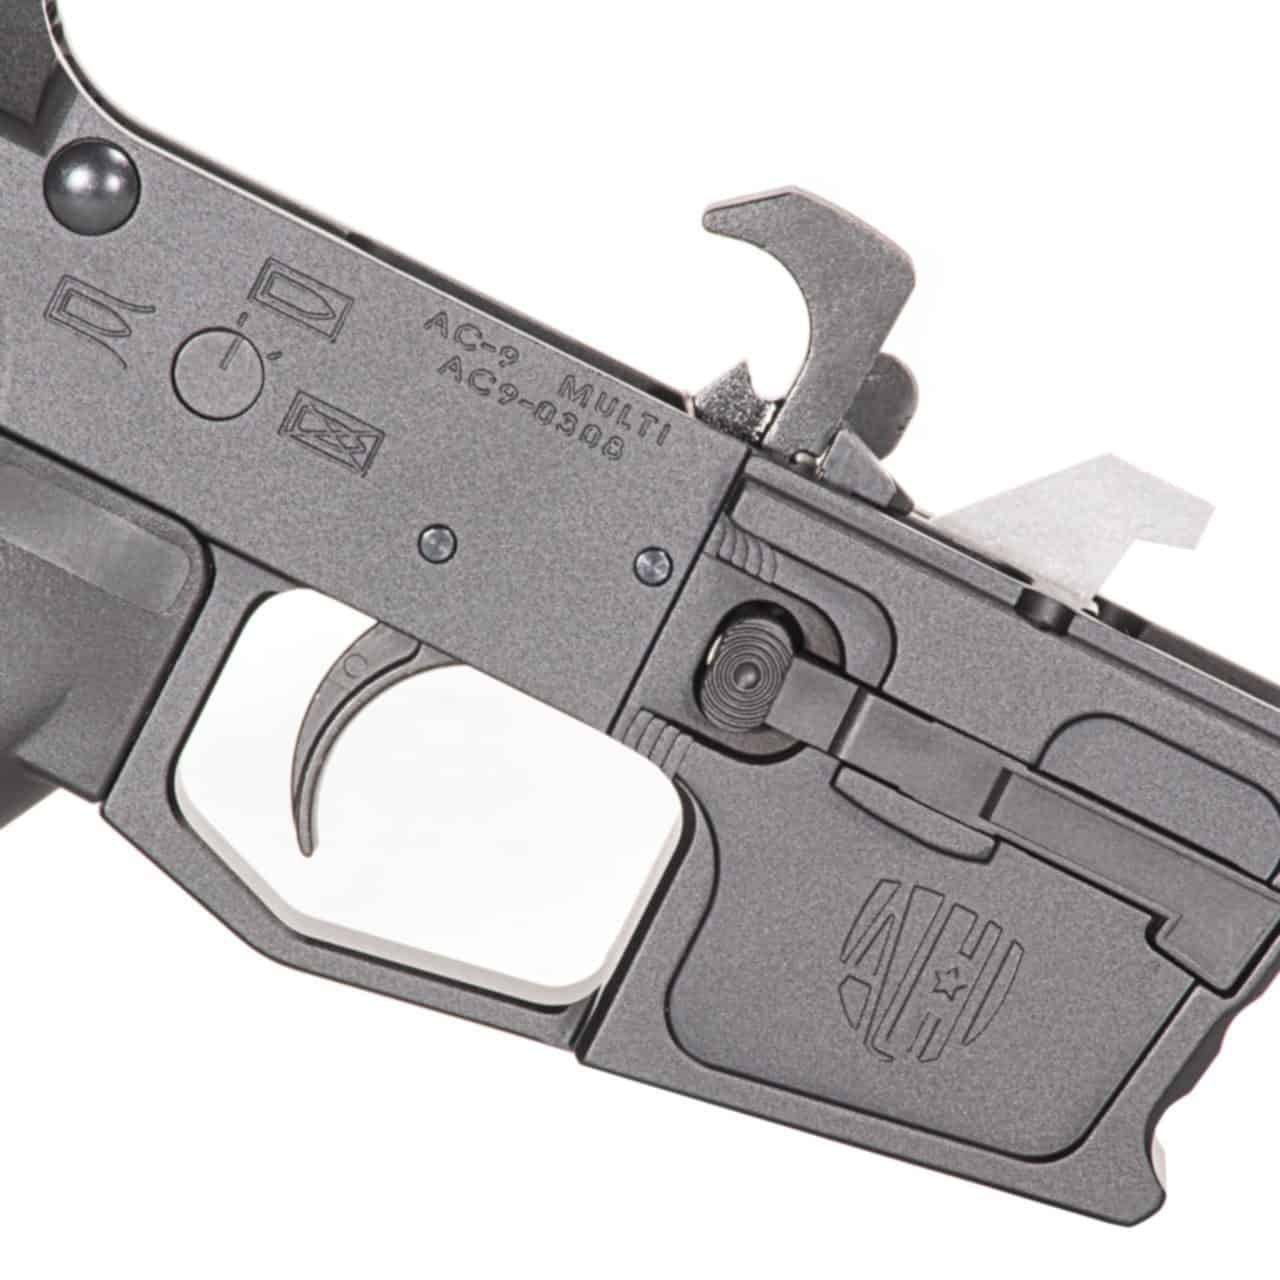 AR9  M4 PISTOL LOWER RECEIVER, ANDRO CORP, SB TACTICAL SBA3 PISTOL BRACE, glock, ar15 9mm